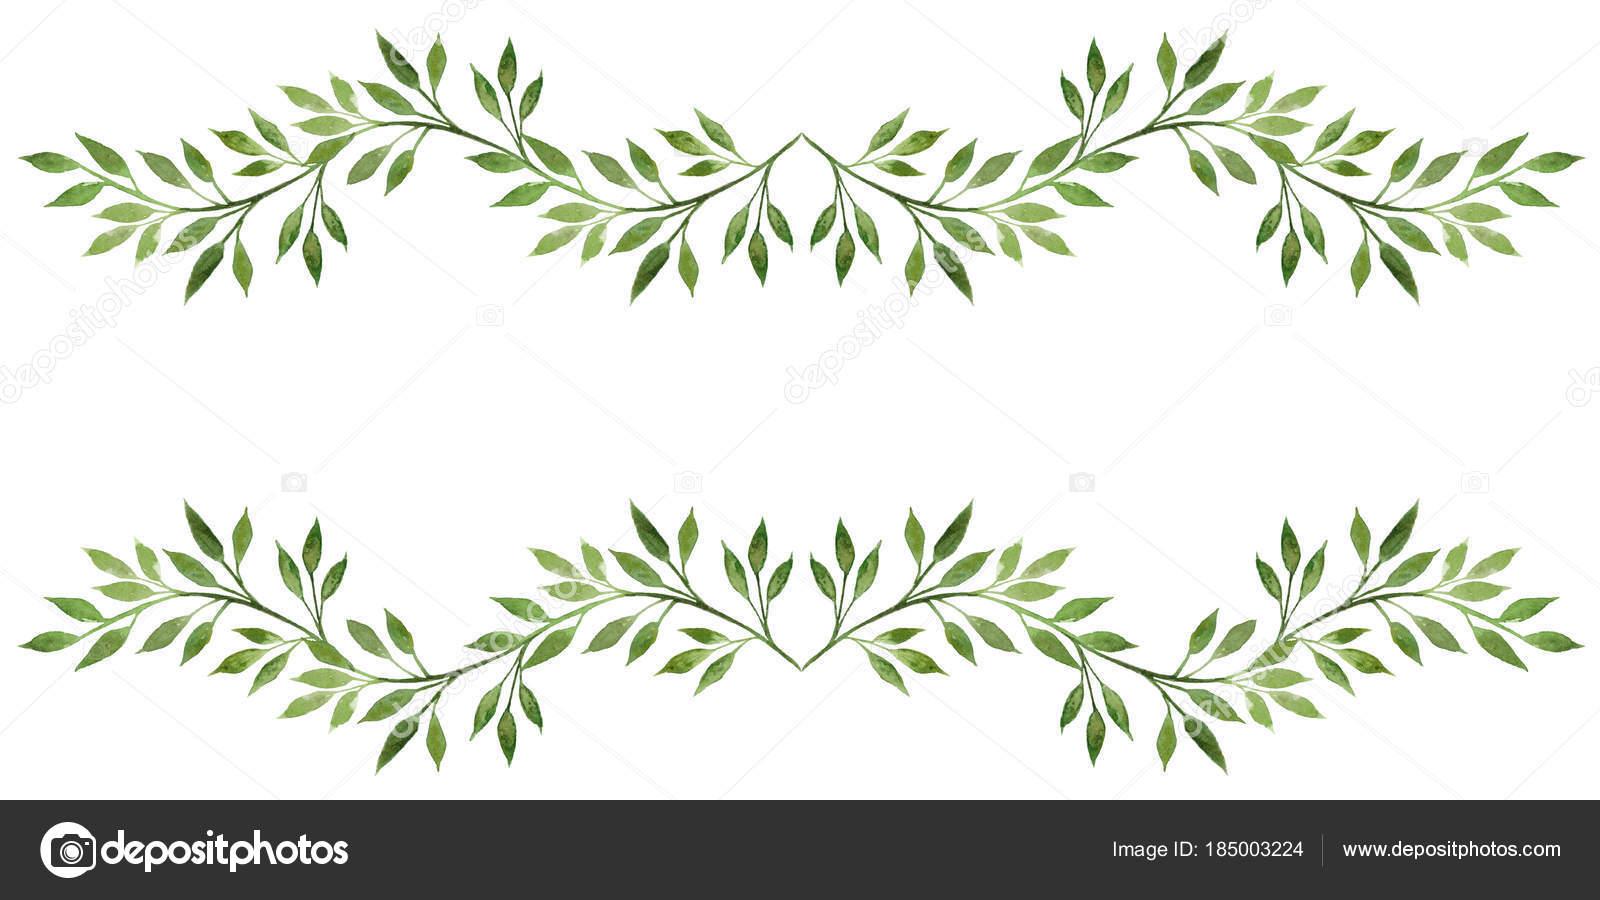 Aquarell Blätter Rahmen Aquarell Handgezeichnete Abbildung Isoliert ...